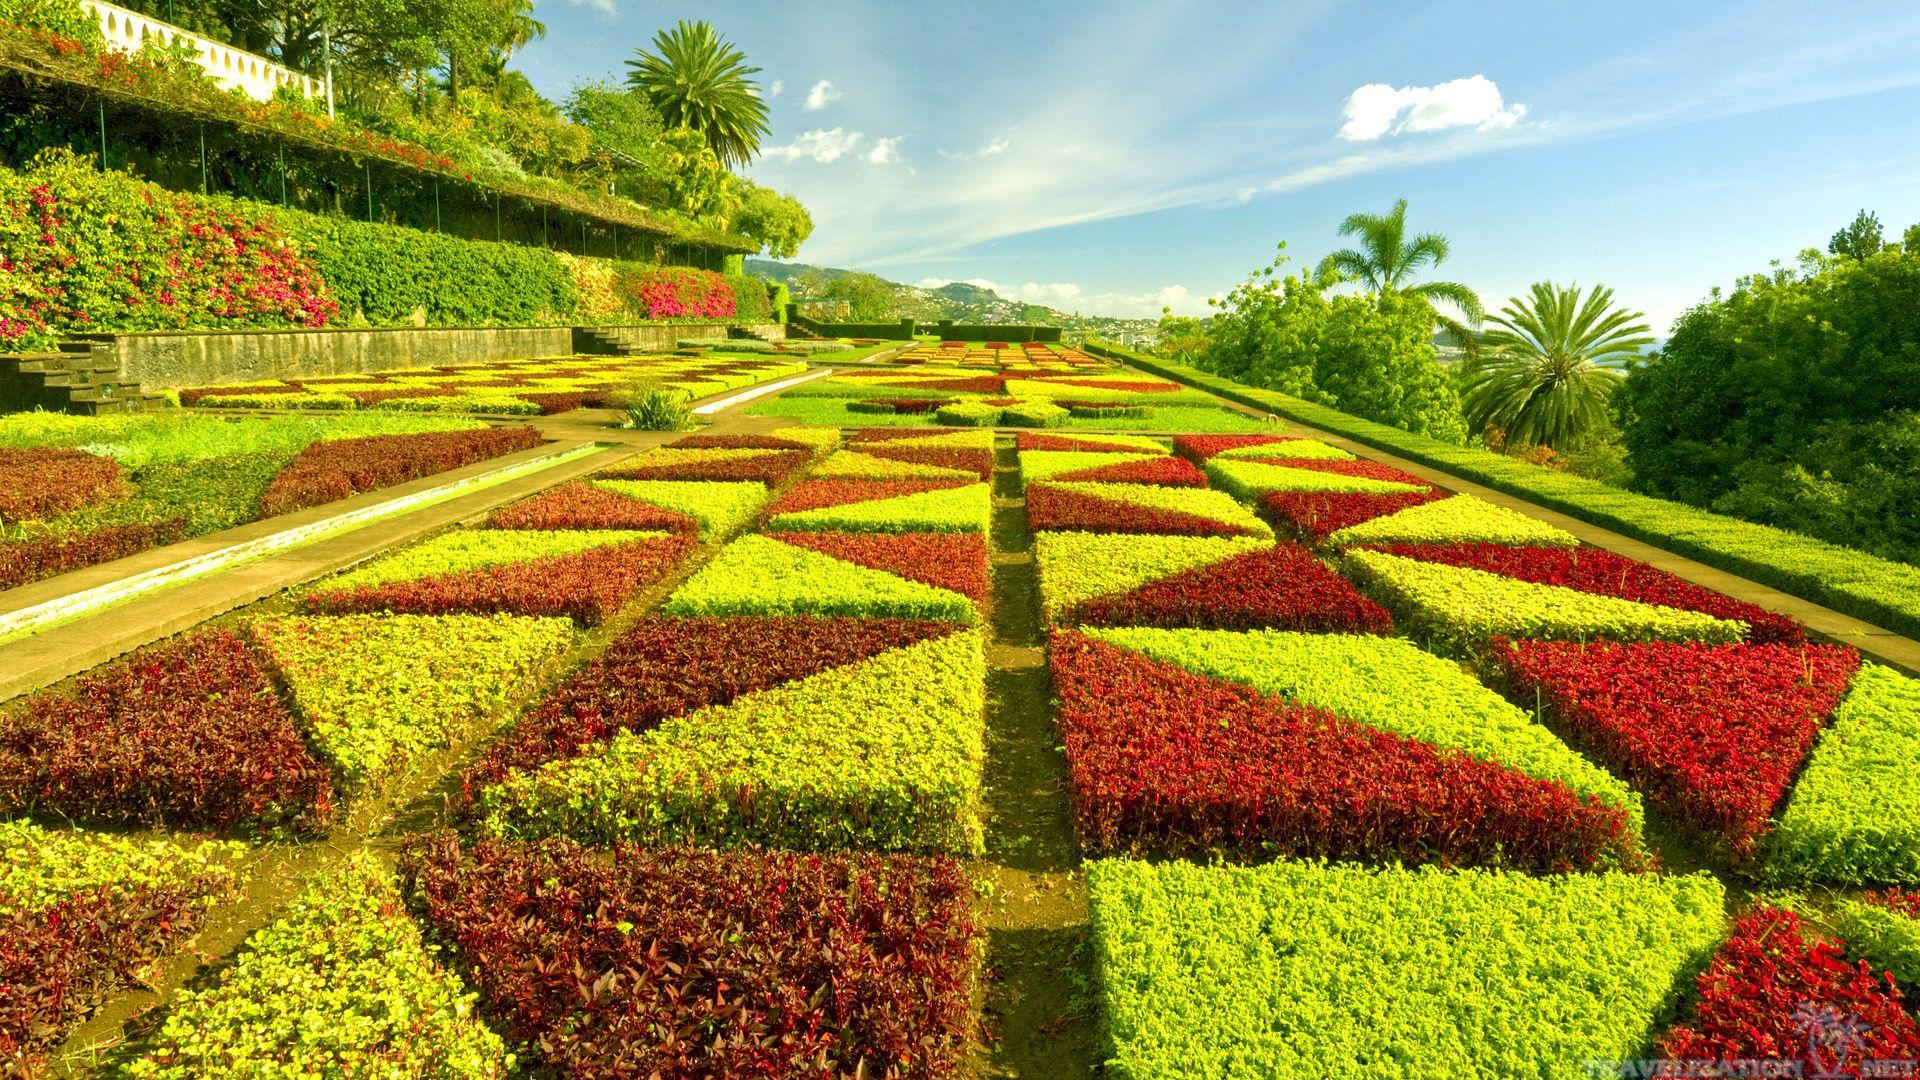 Download Beautiful Green Garden Wallpaper Full HD Wallpapers 1920x1080